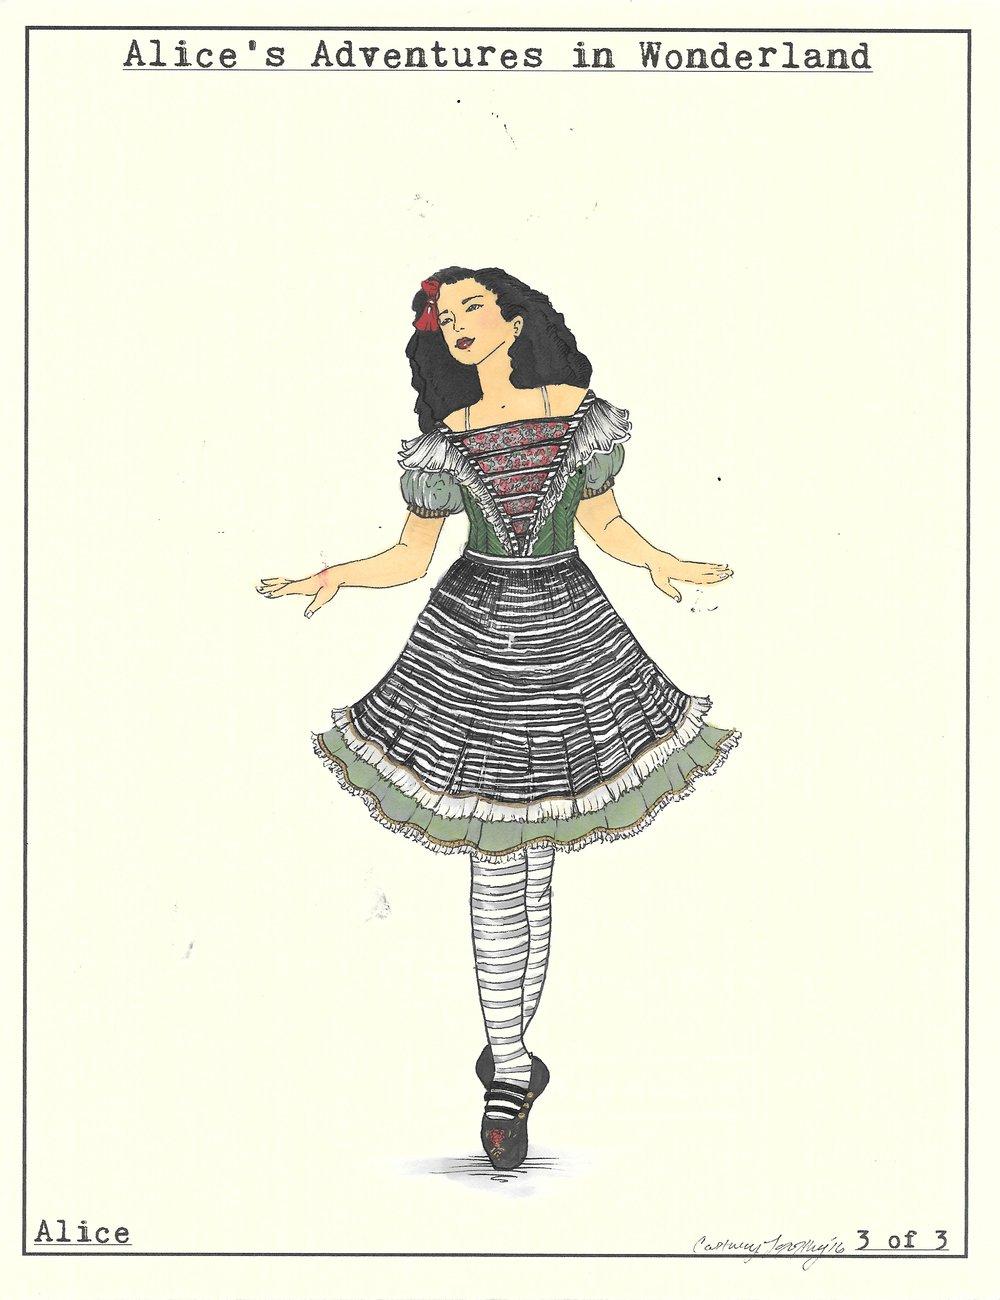 Alice look 3 of 3 Wonderland